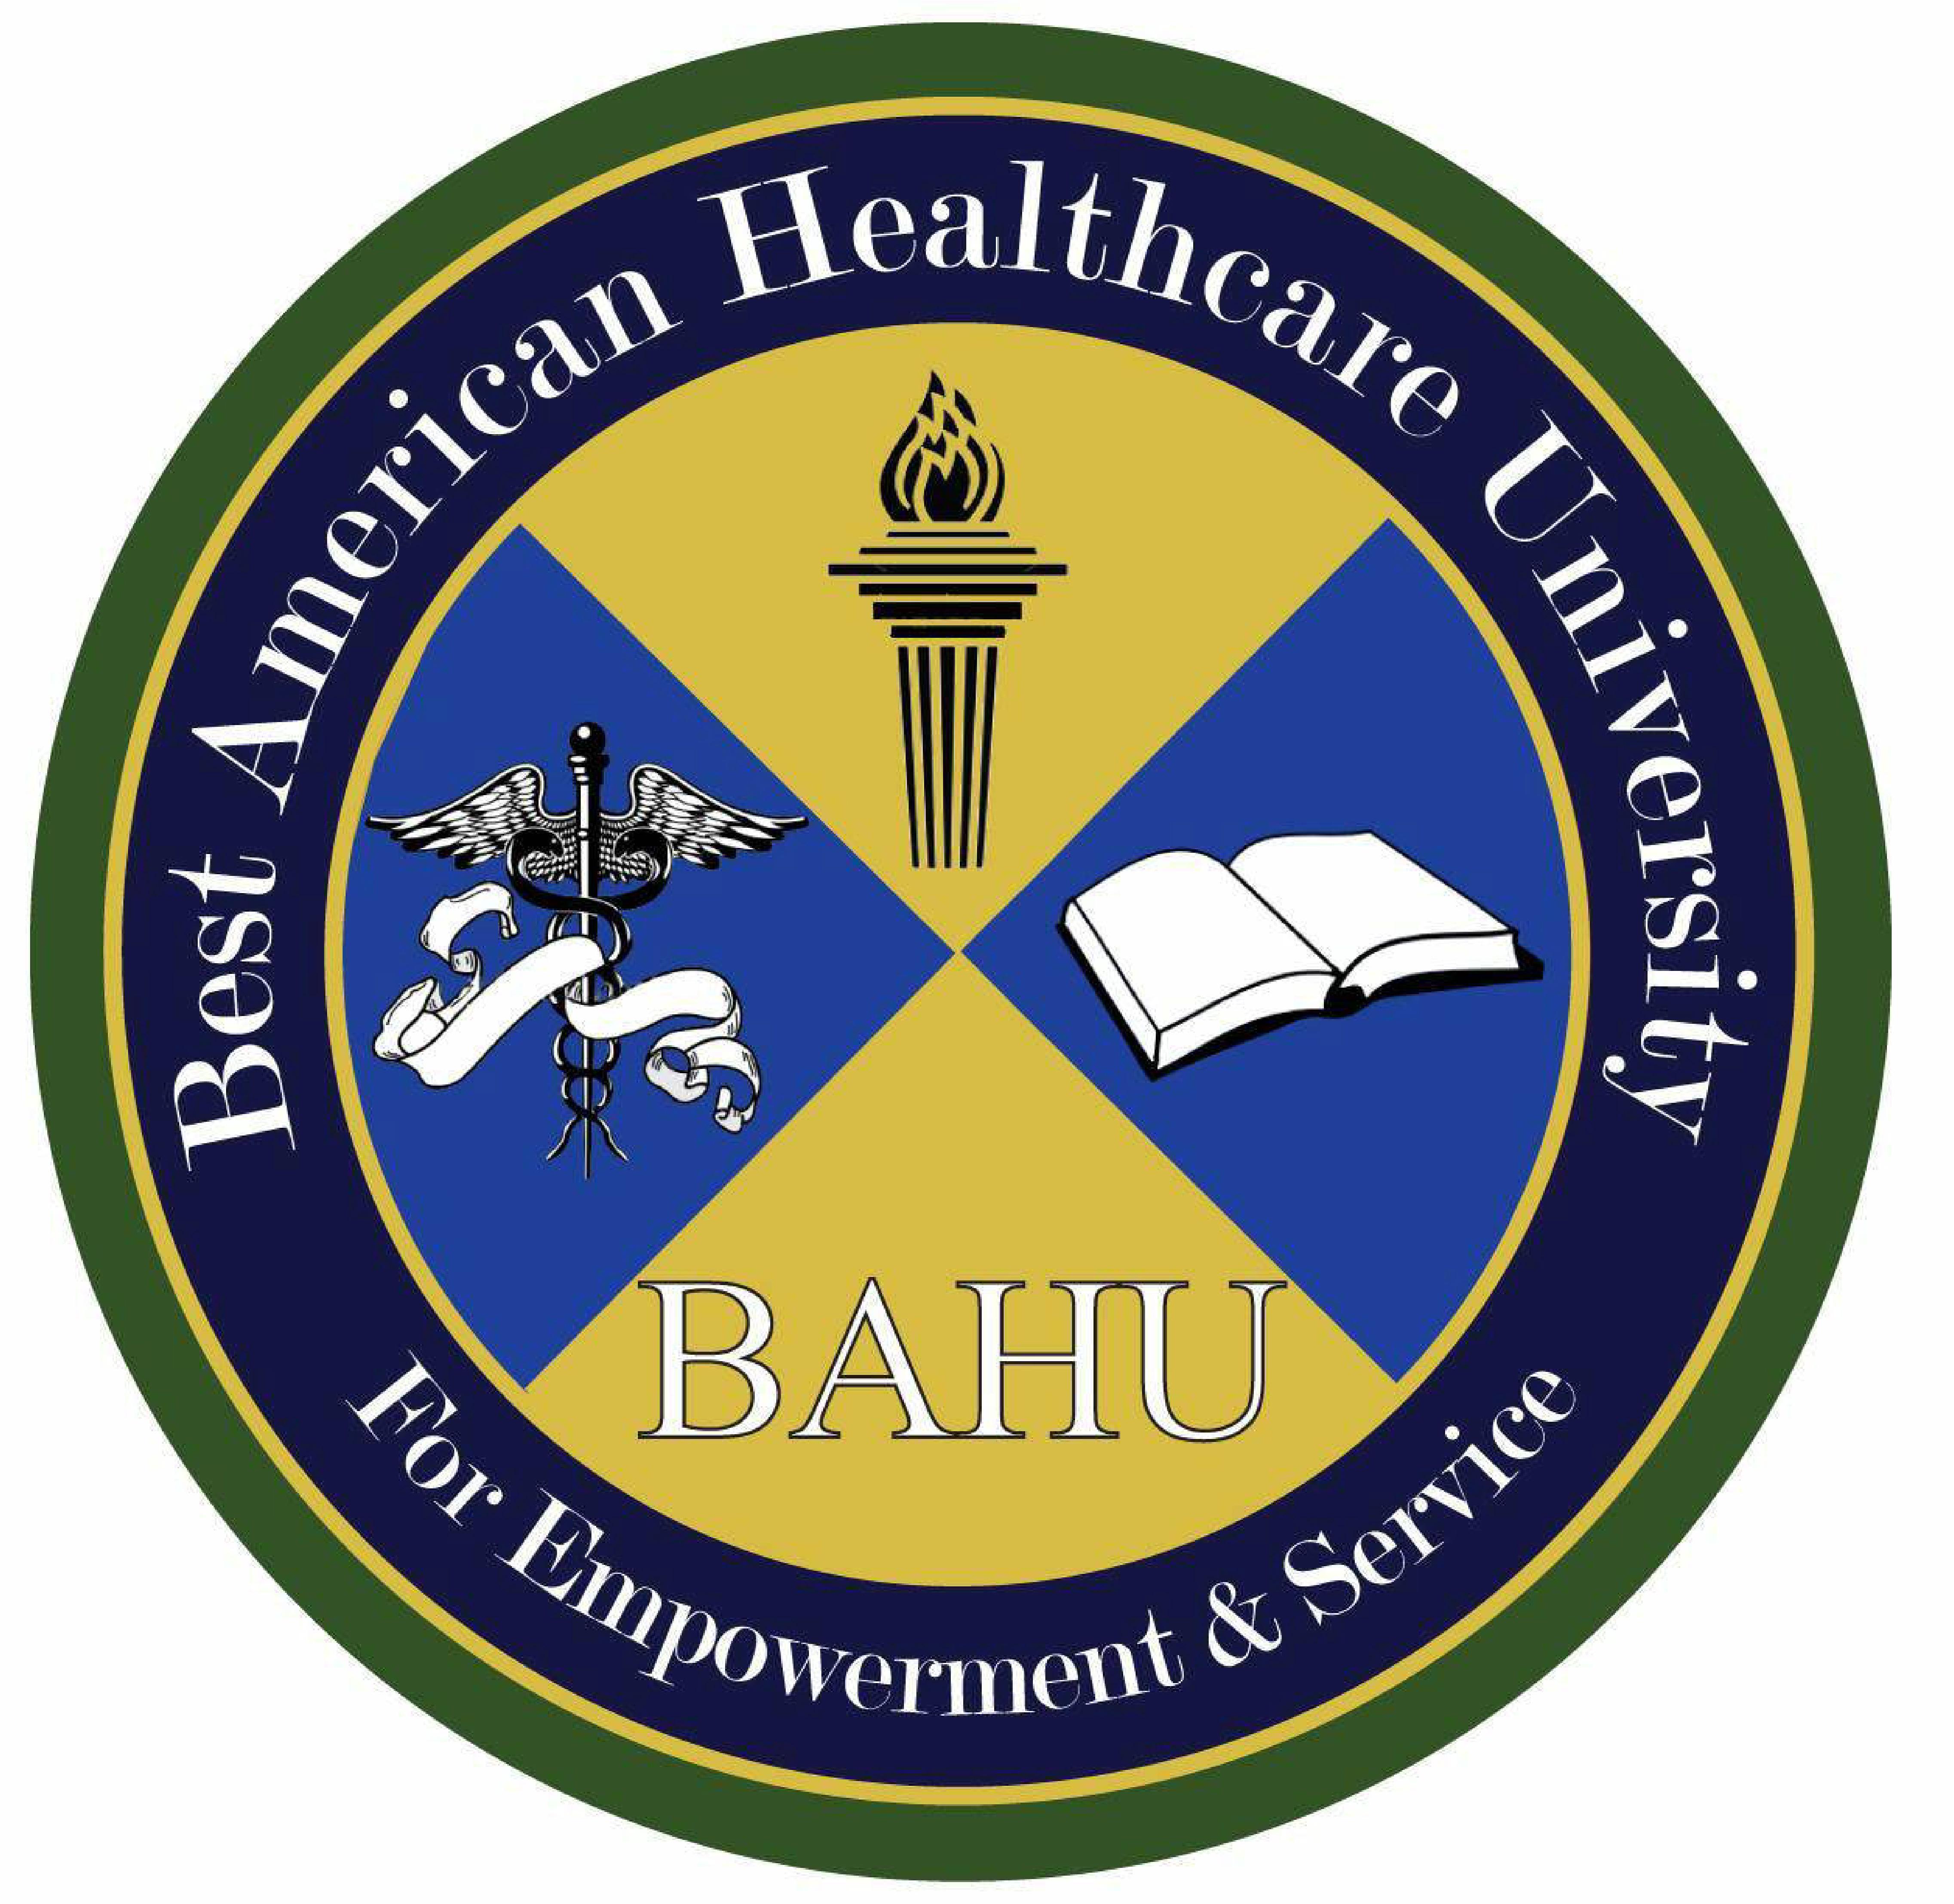 Home Health Aide Certification Training Ontario, CA